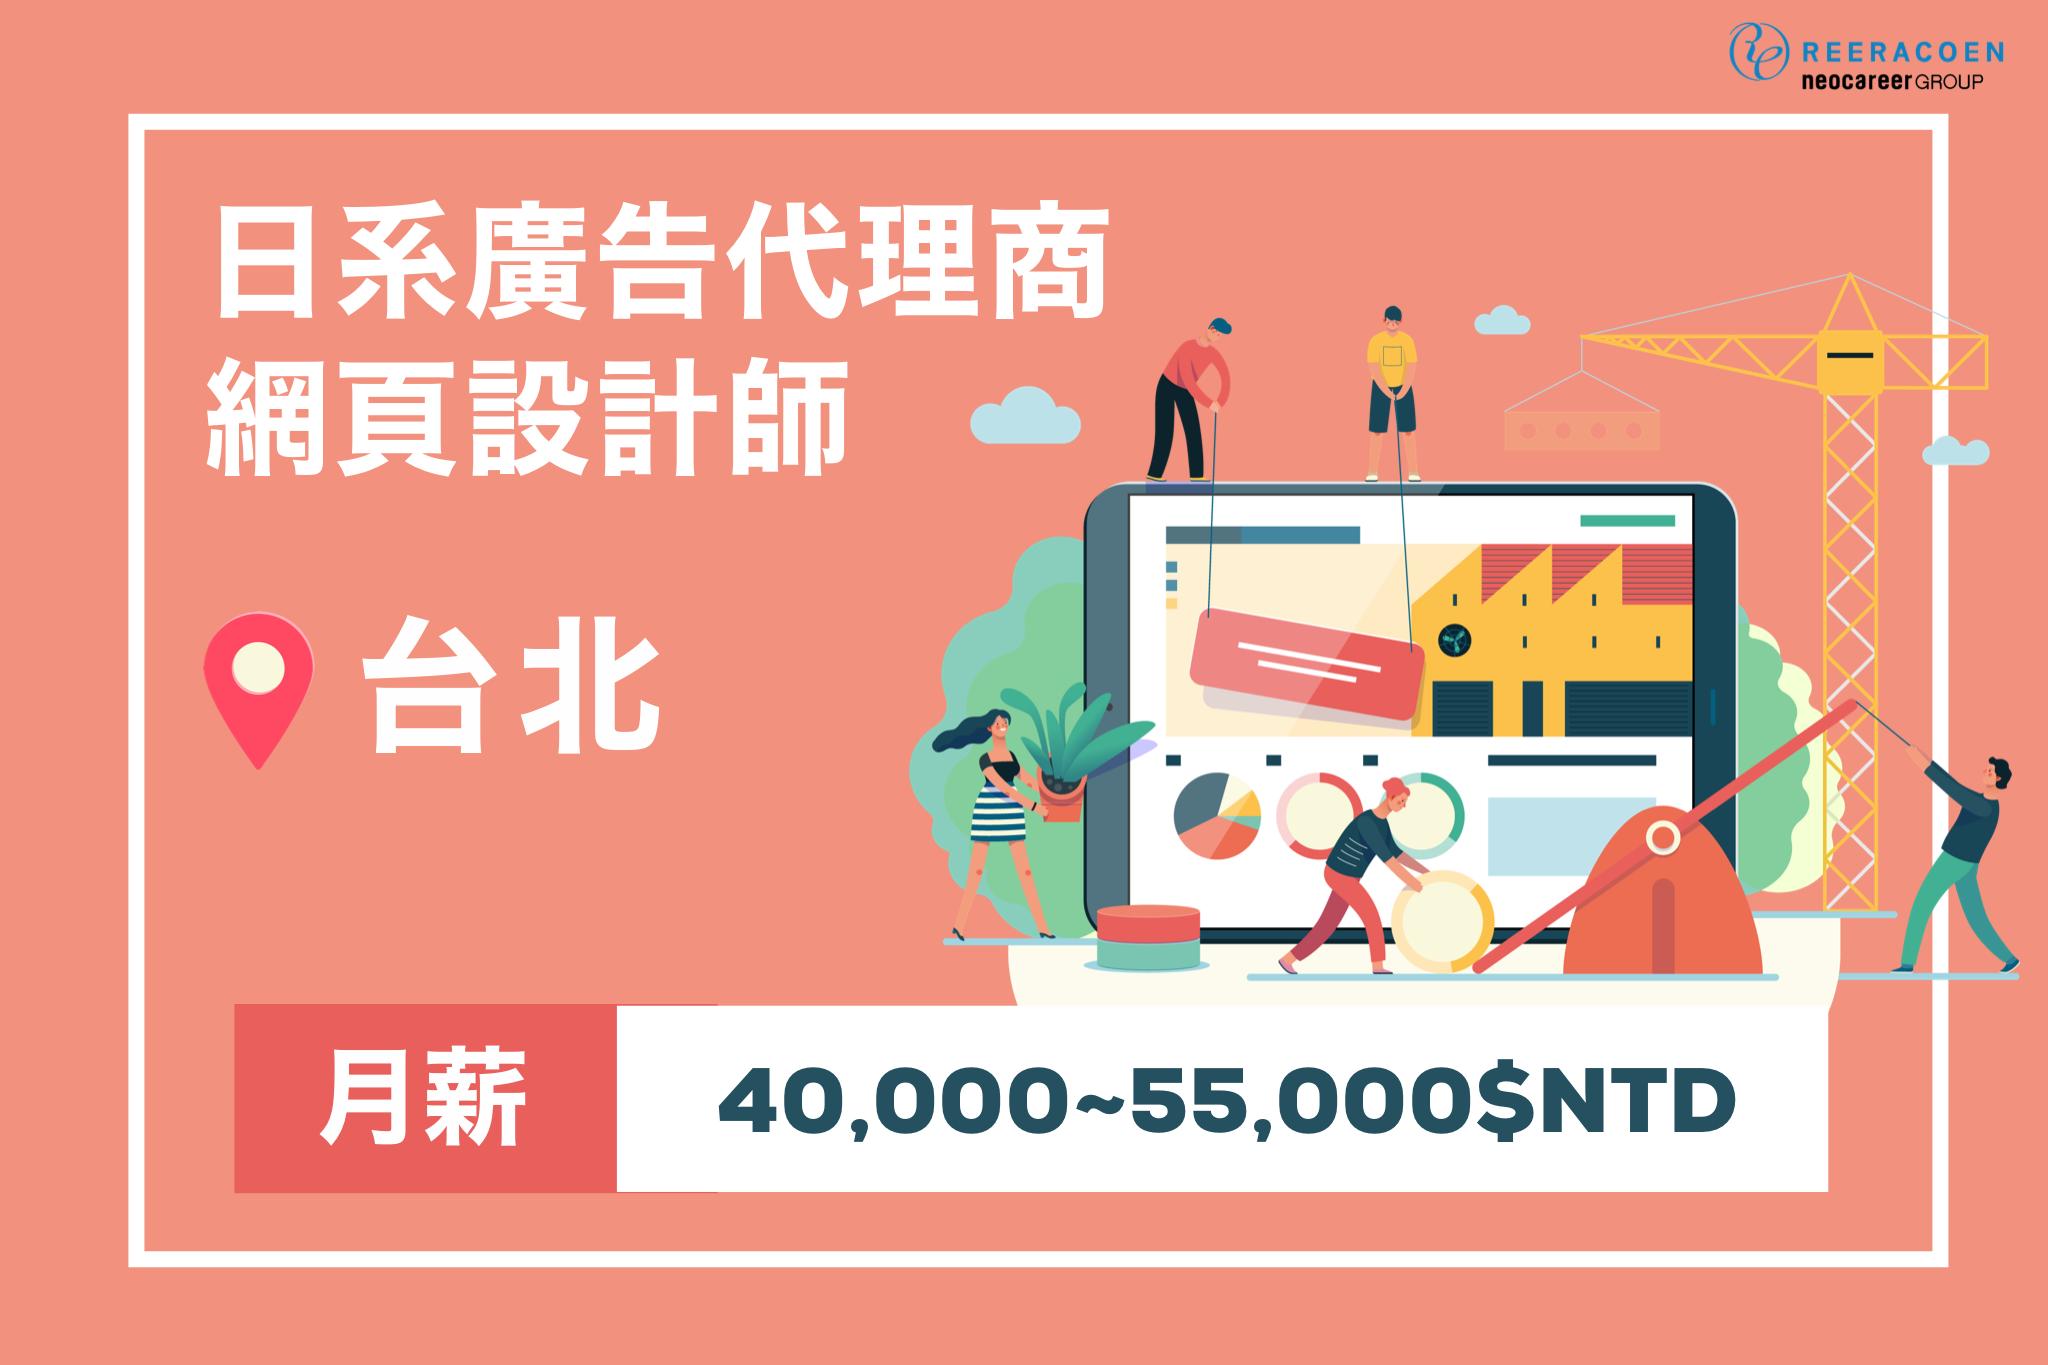 【JOB】『網頁設計師』薪水4萬起跳!日系廣告代理商徵才招募中!!